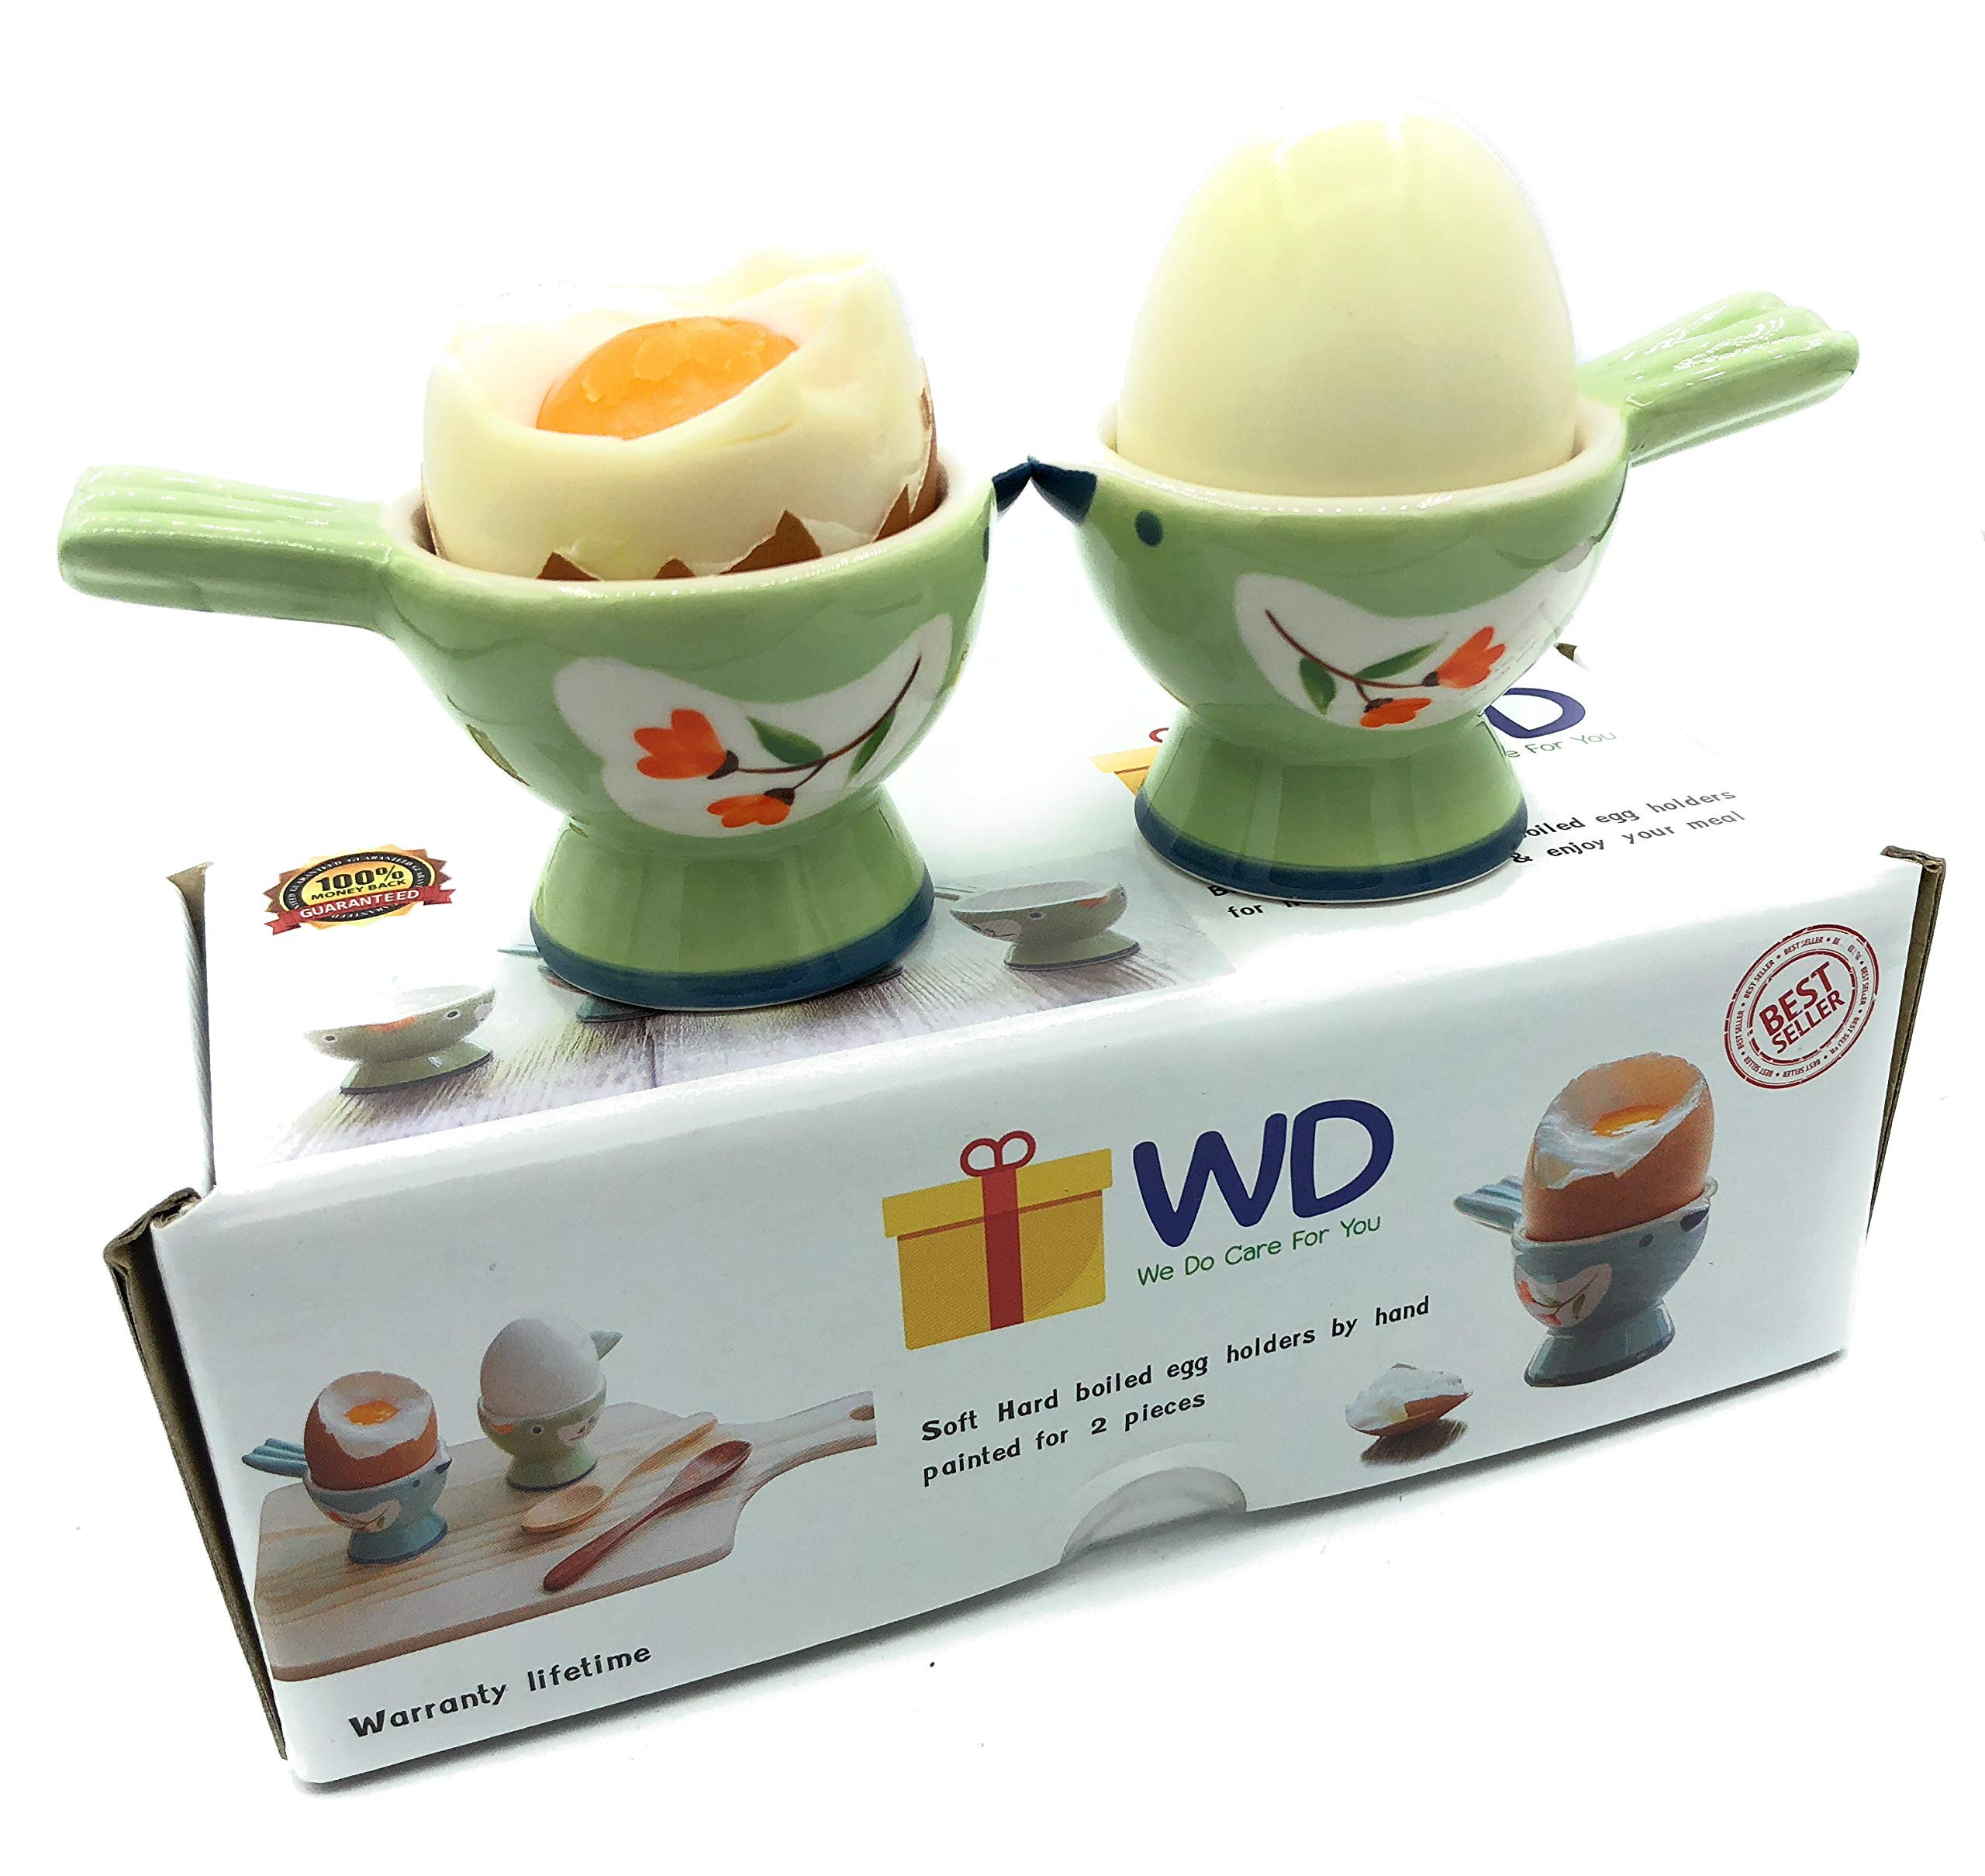 Egg Cups Egg Cup Cute Ceramic Soft Boiled Egg Holder for Breakfast Brunch Egg Holders Color : Green